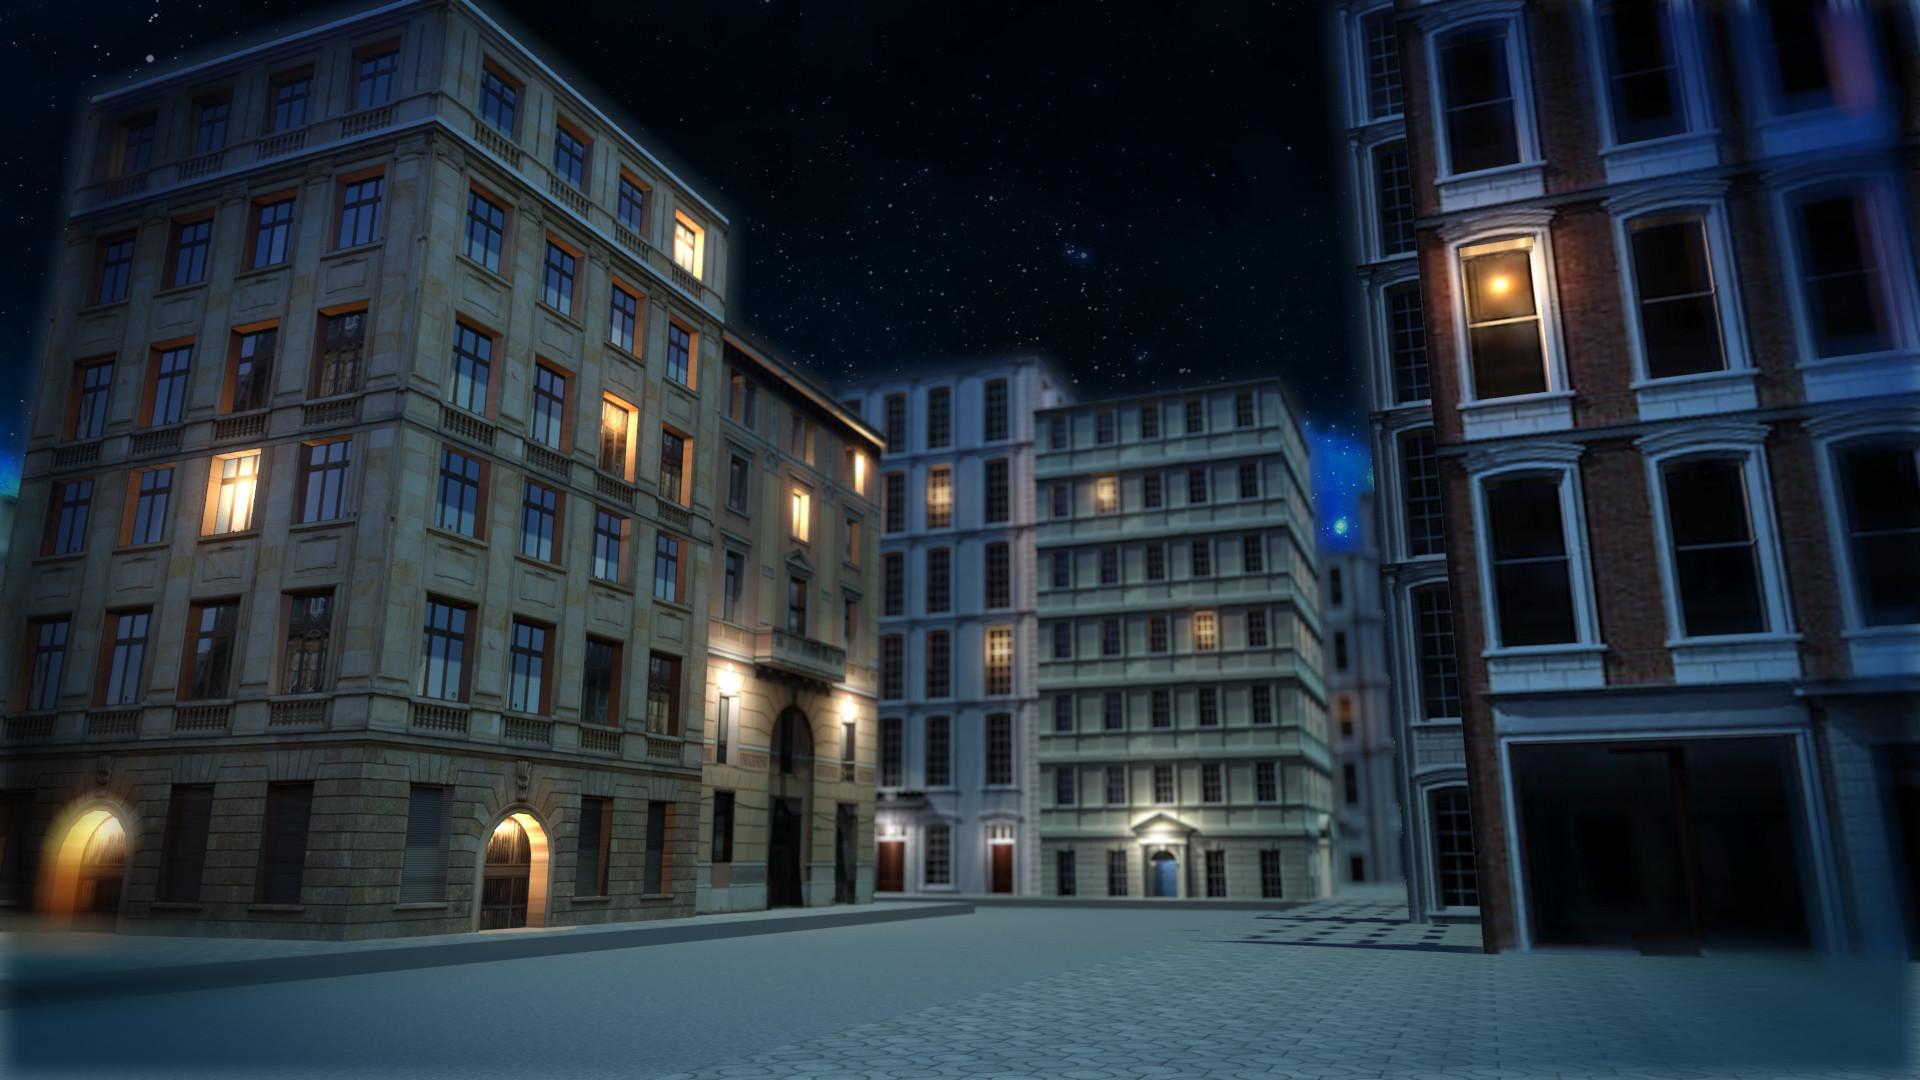 Petar doychev city 00